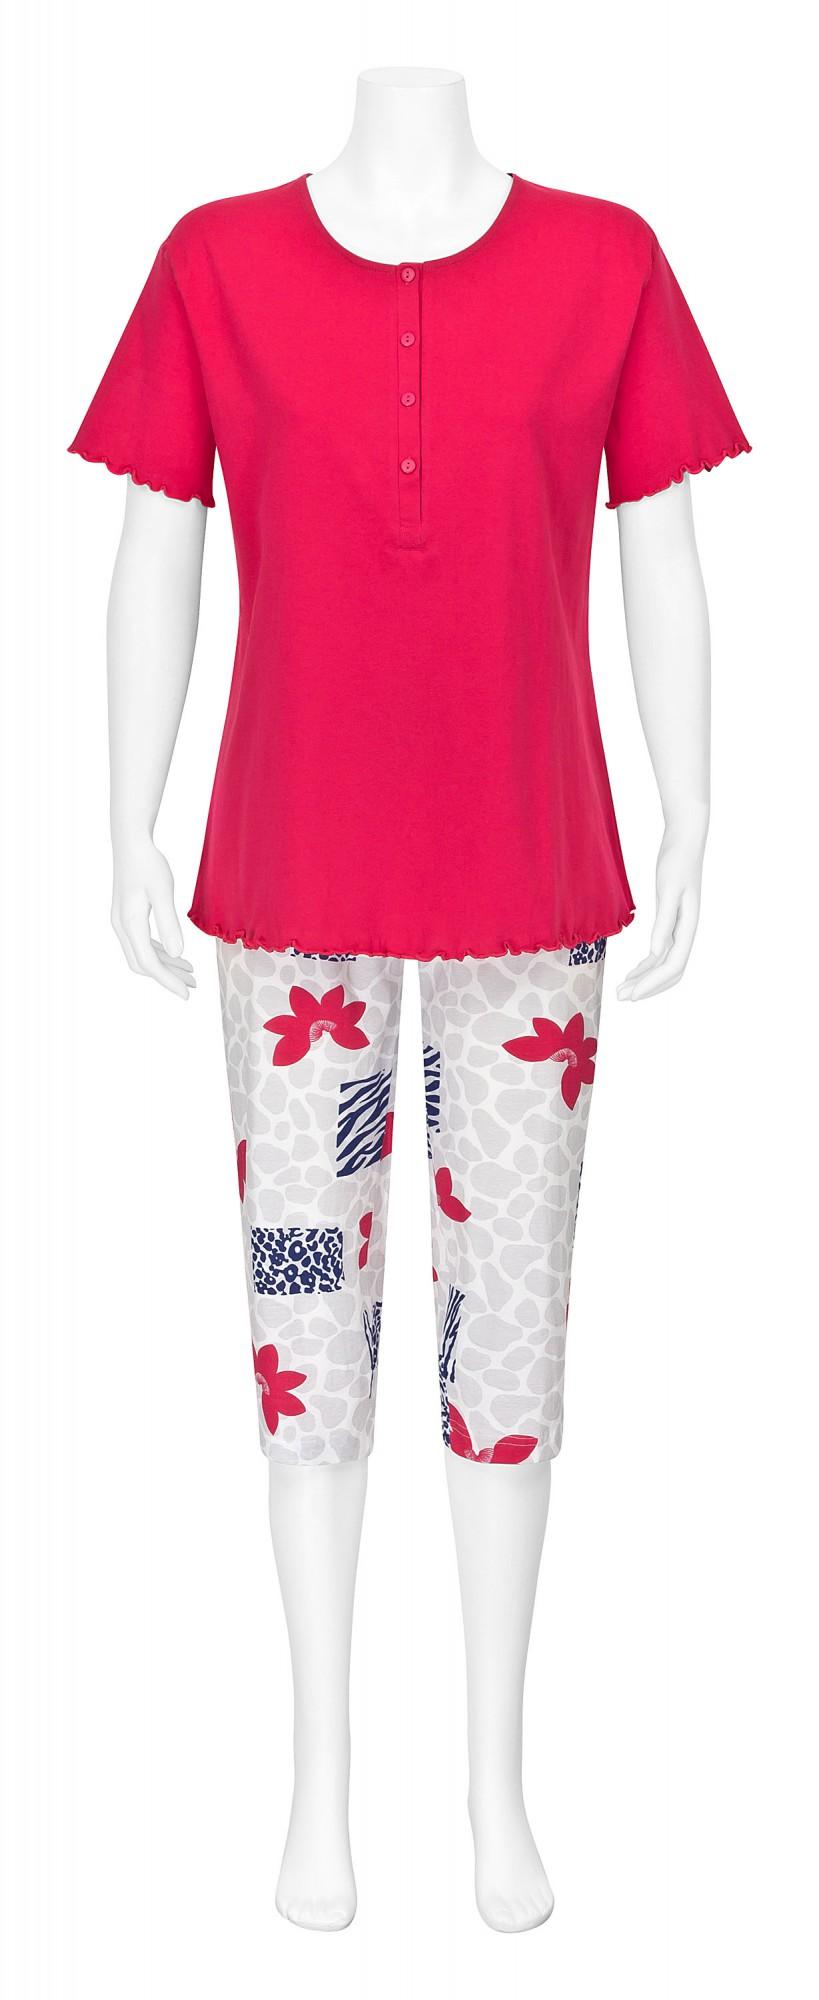 Damen Capri Pyjama kurzarm Schlafanzug mit Knopfleiste – 161 204 90 815 – Bild 2